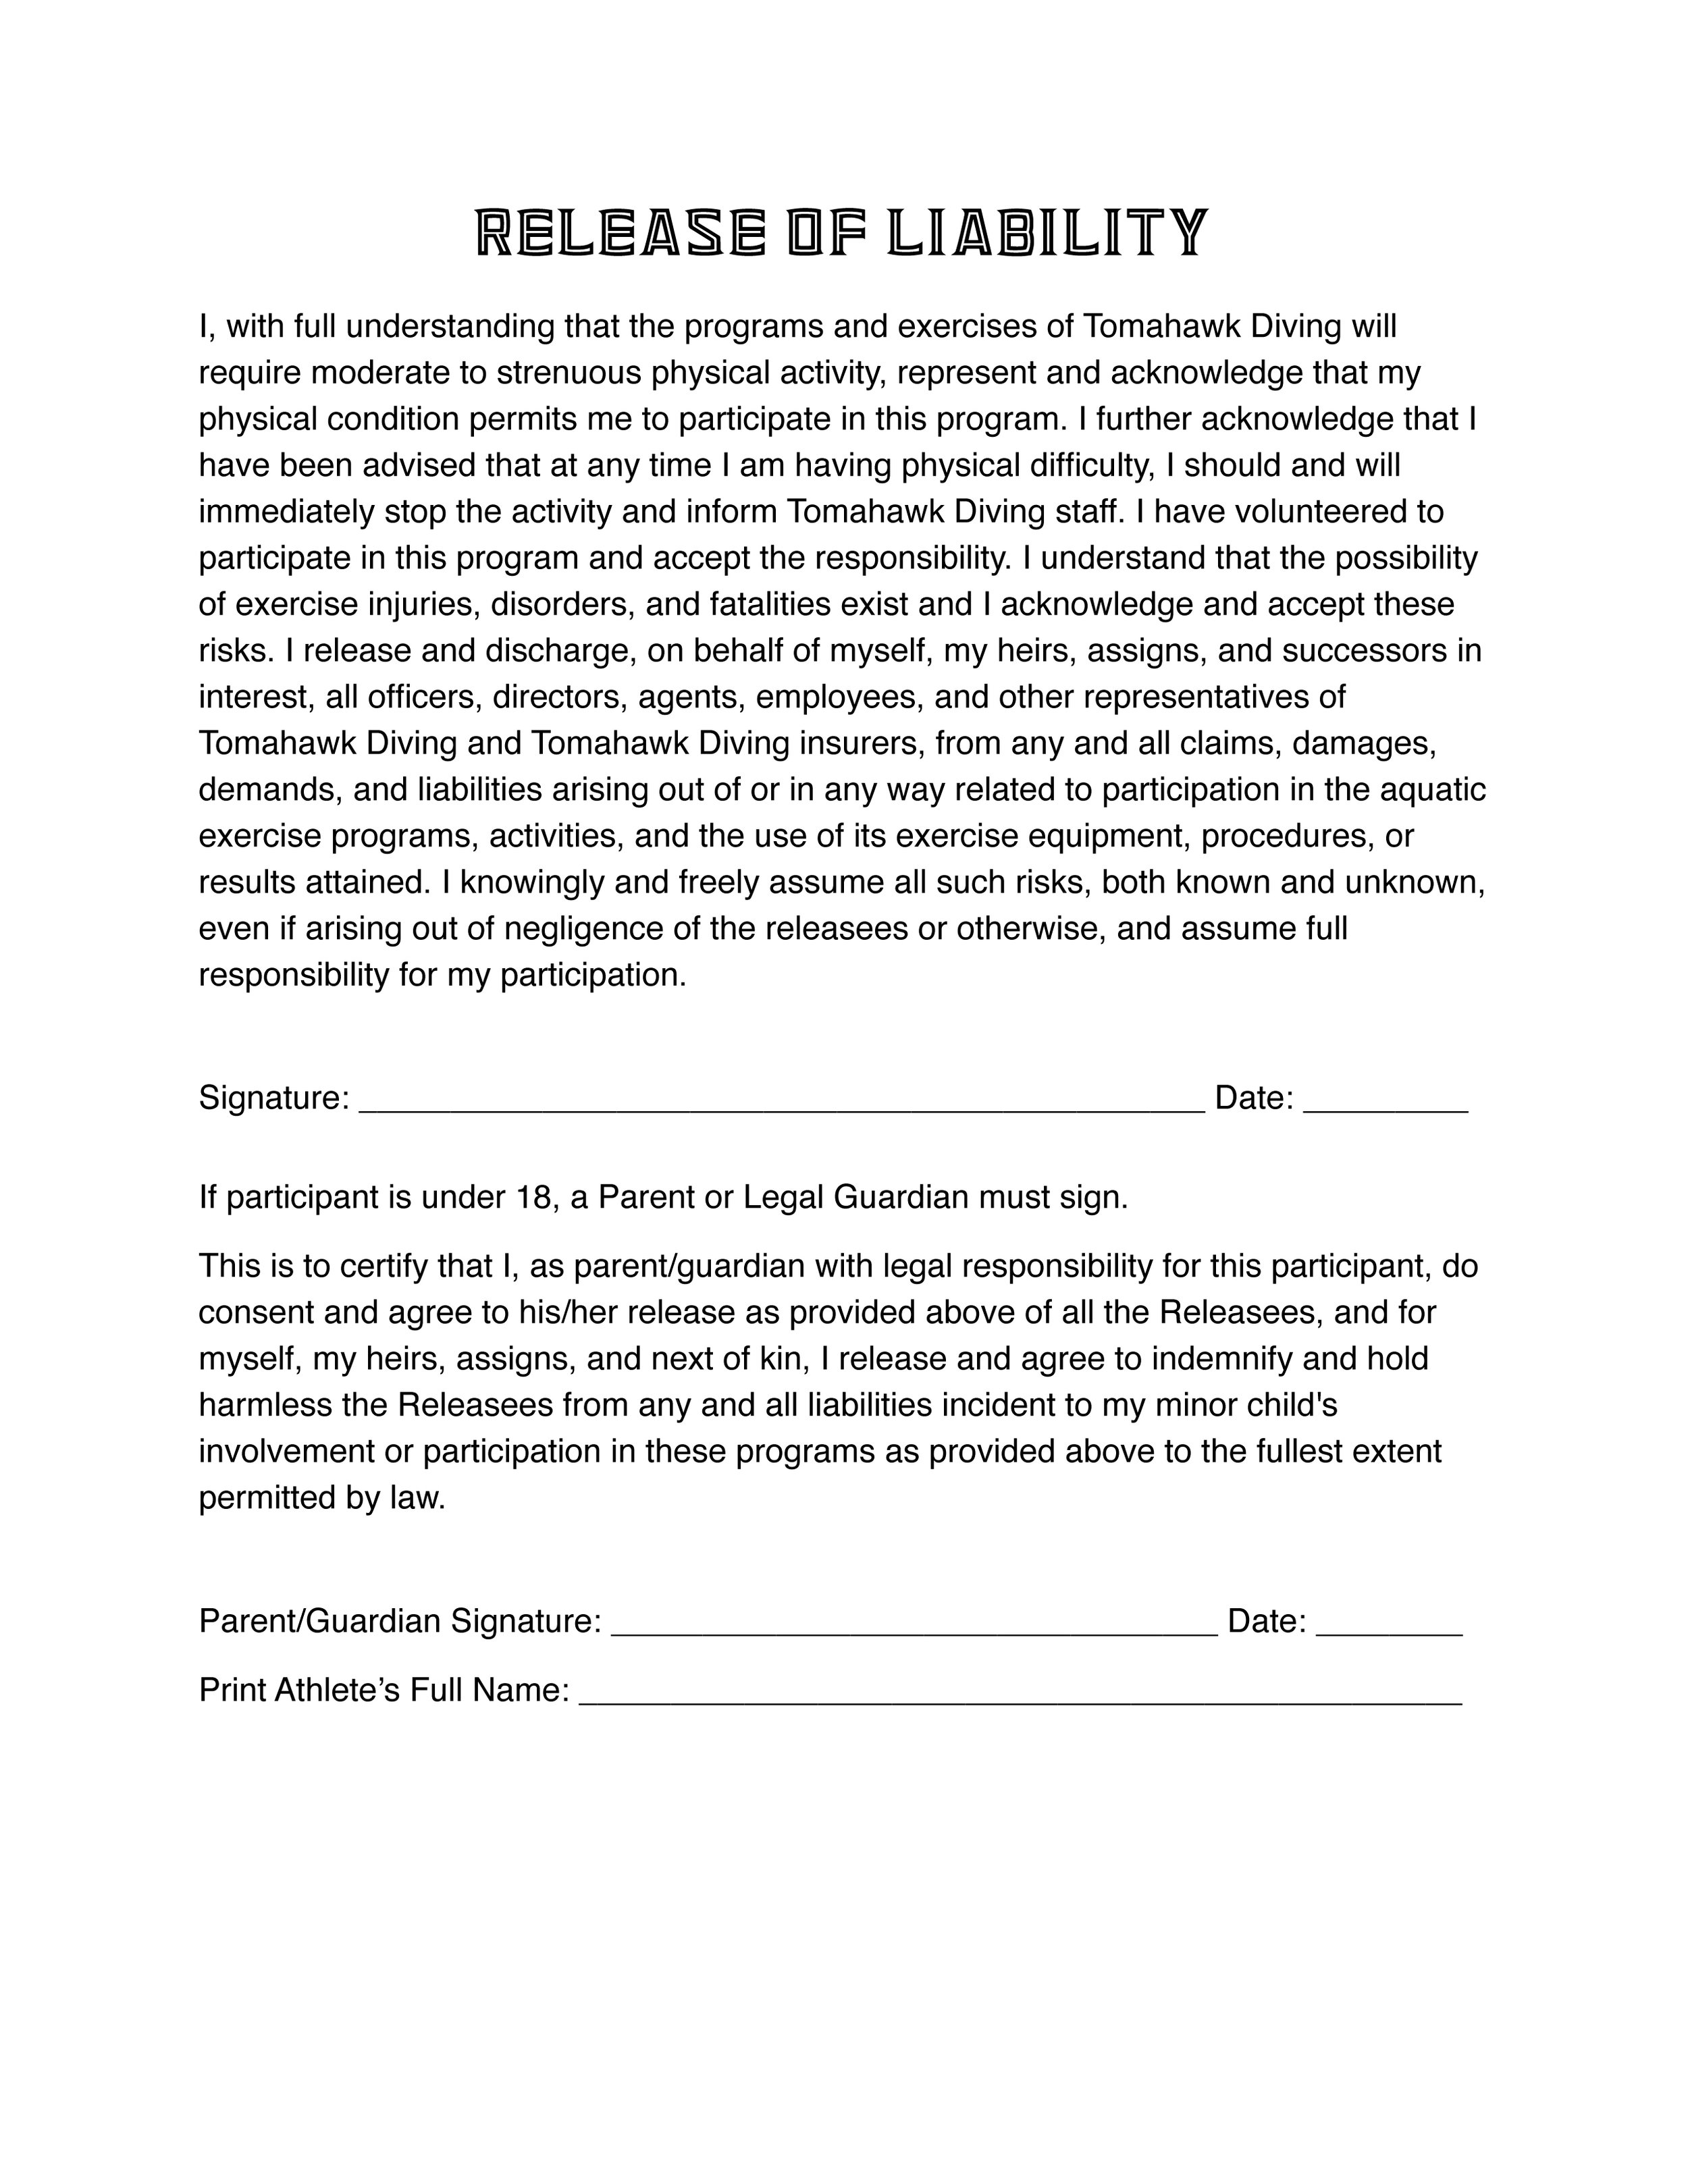 TD Waivers PDF-1.jpg